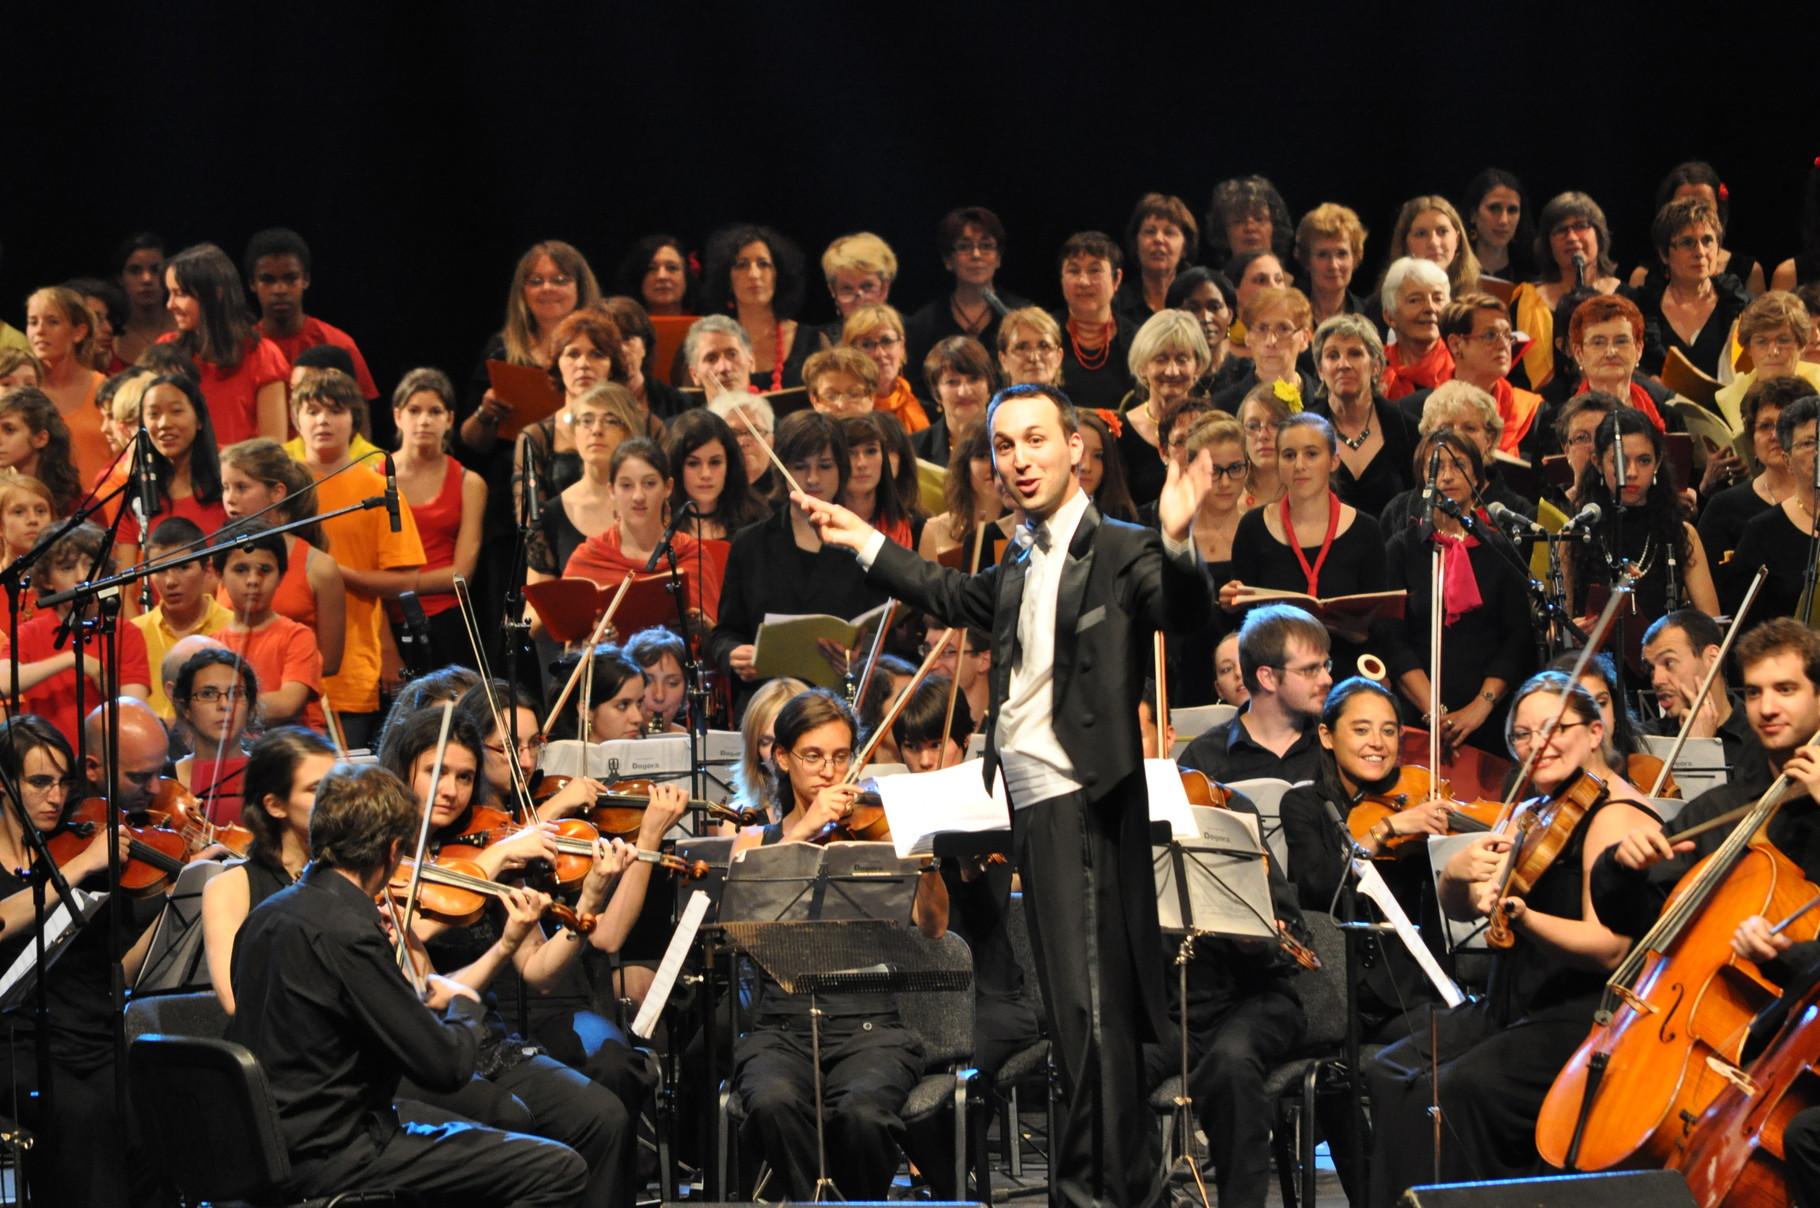 2011 - Dogora, au Zenith d'Auvergne